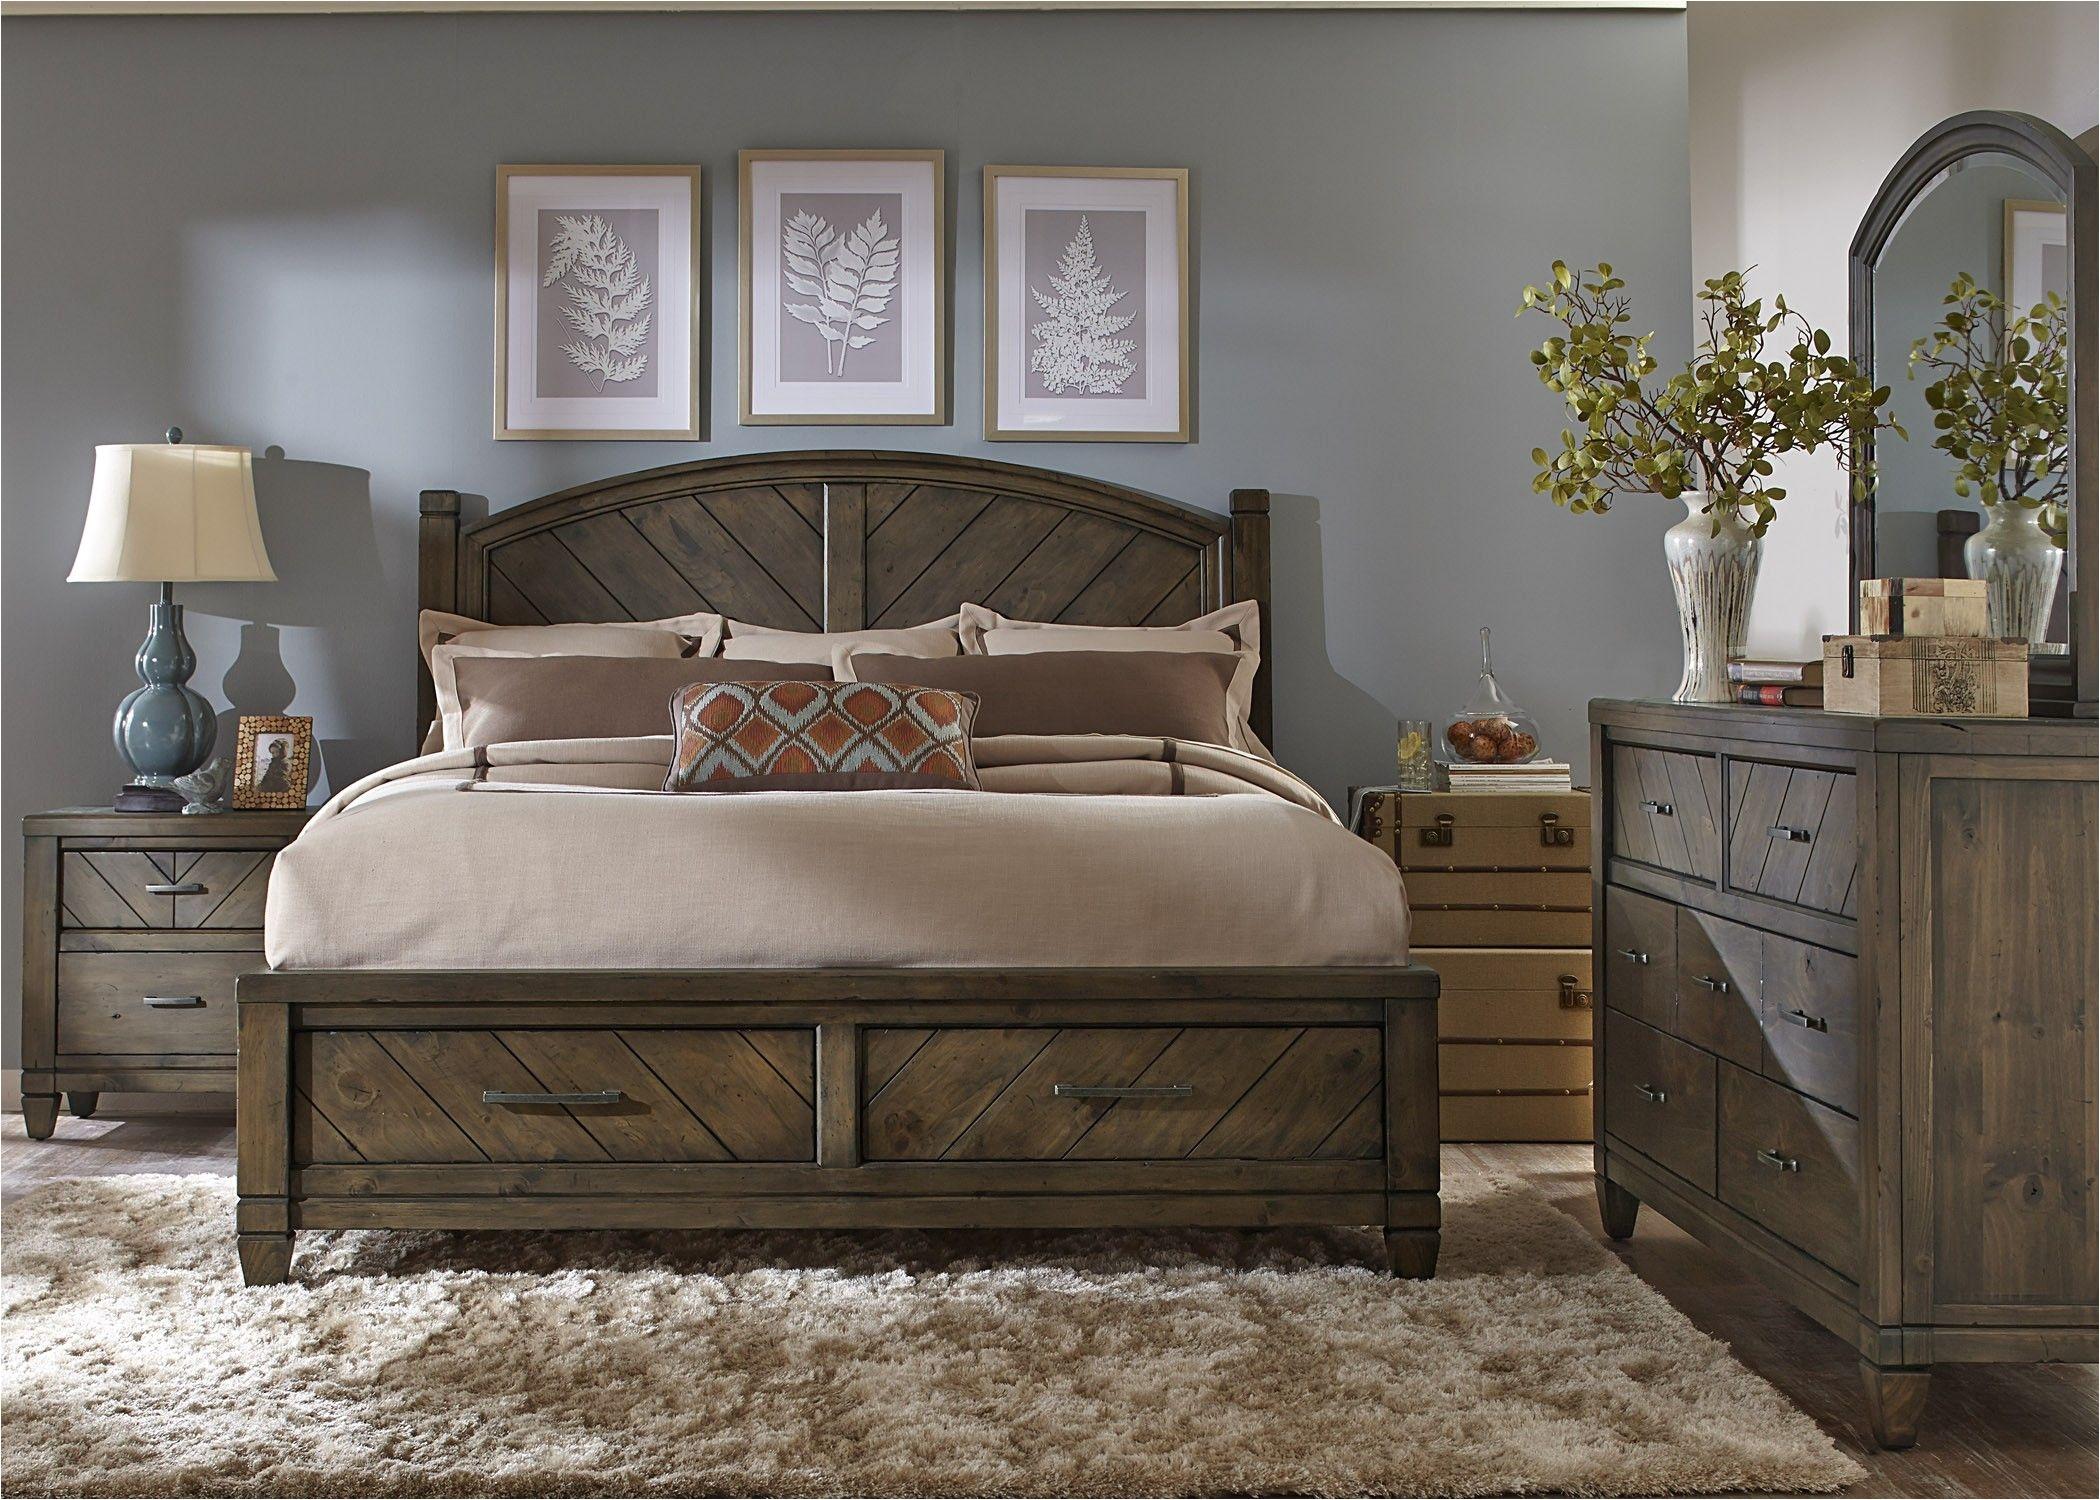 Mathis Brothers Master Bedroom Sets Modern Country Bedroom Set Pinterest Modern Country Bedrooms